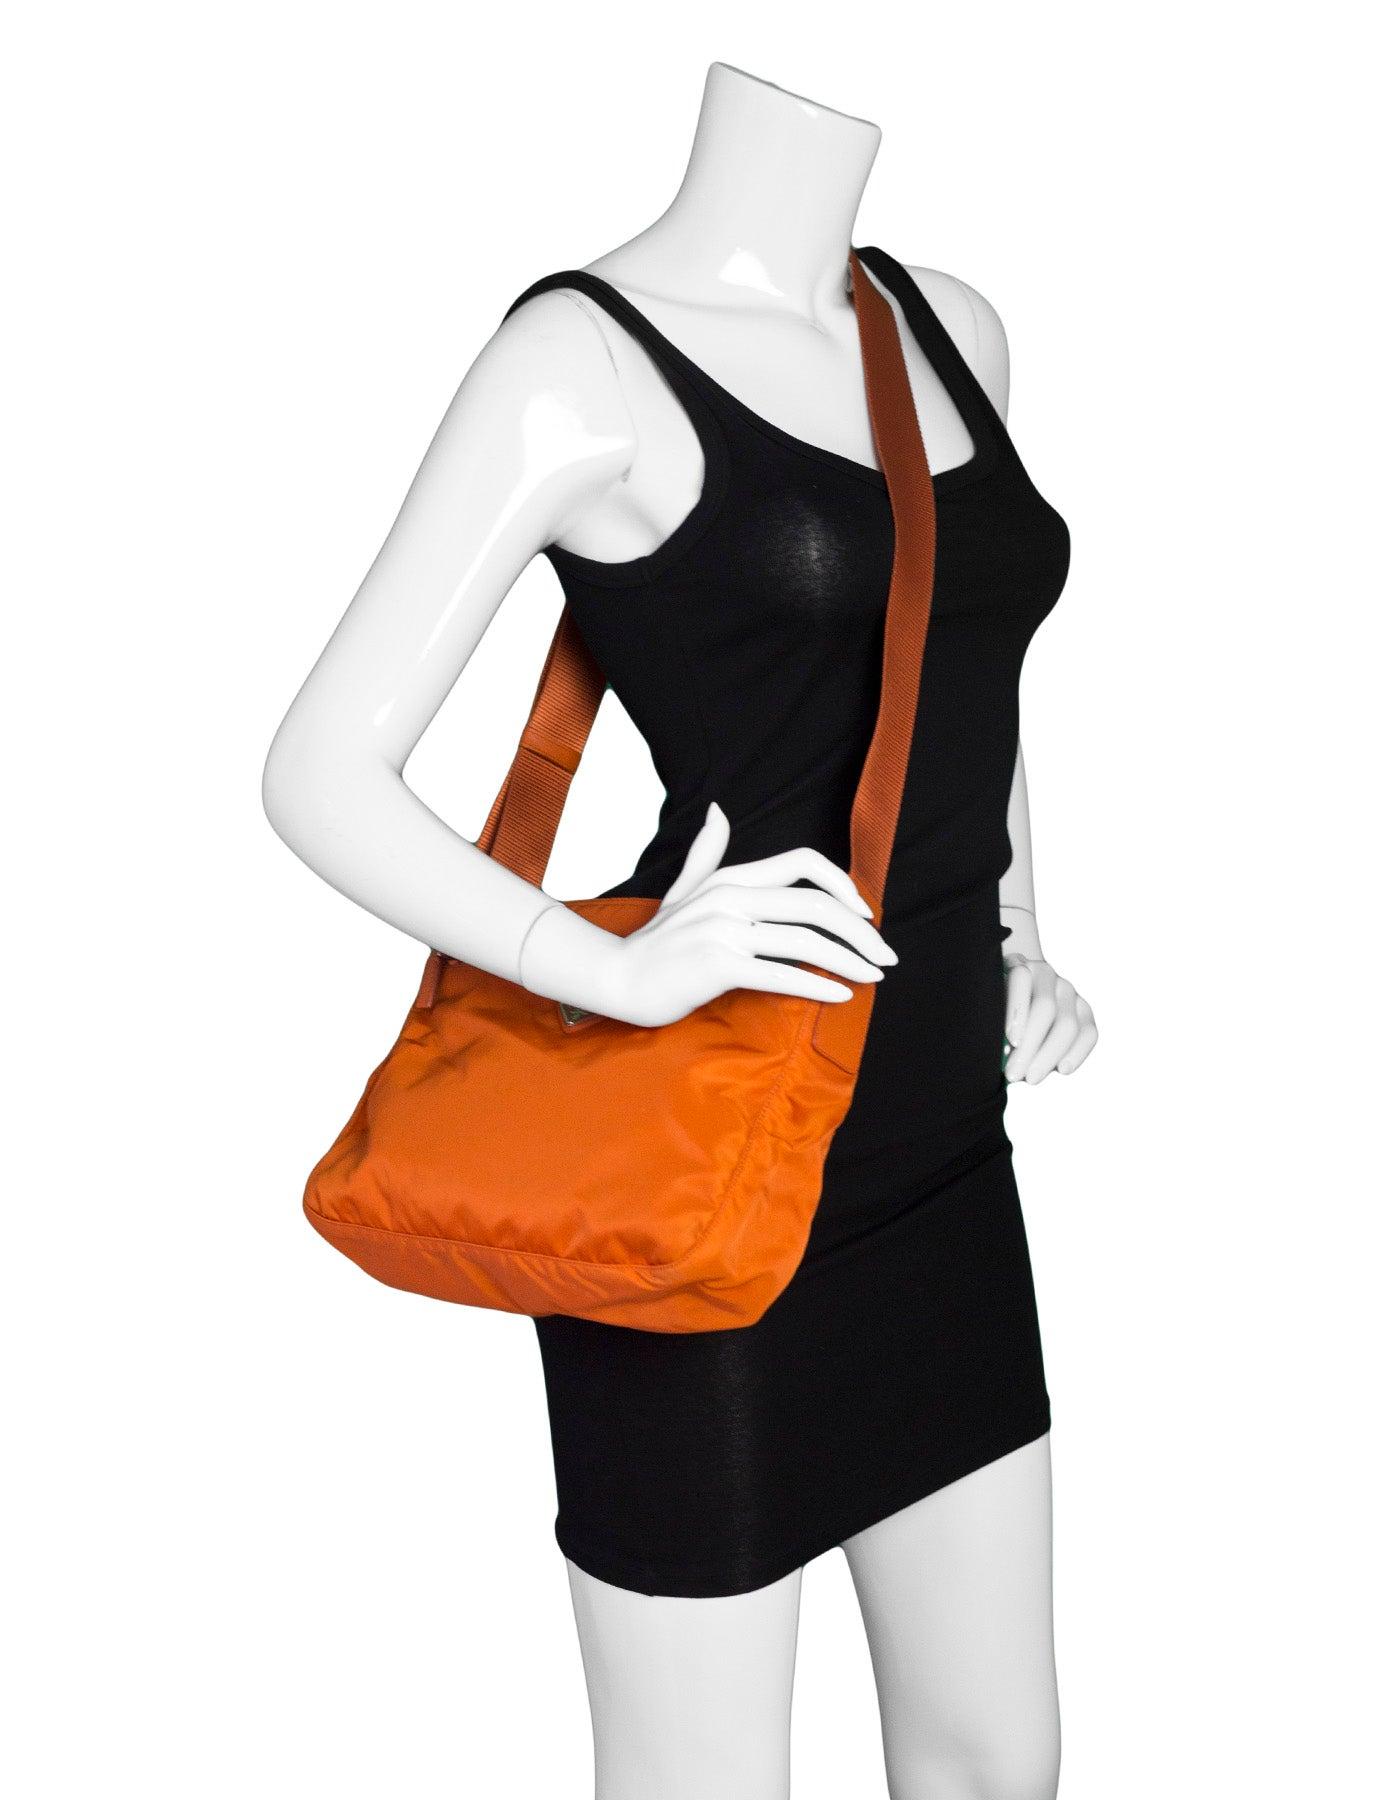 c44f754334b6 ... czech prada orange tessuto nylon messenger crossbody bag for sale at  1stdibs 8a6c7 ad43e